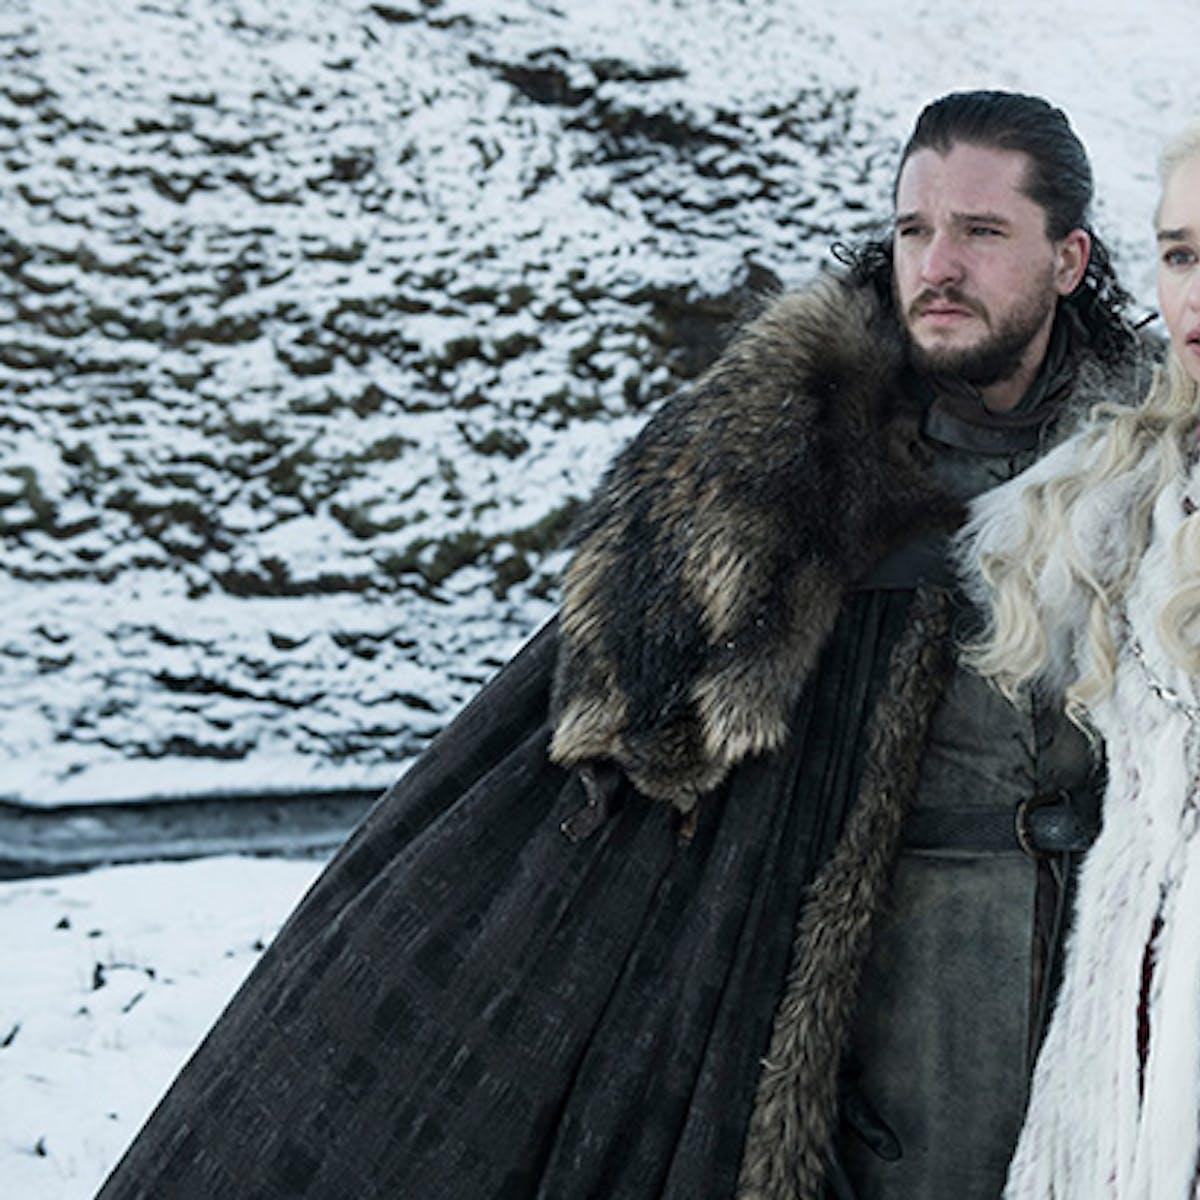 Game of Thrones' Season 8 Spoilers: Dany's Pregnancy Could Doom